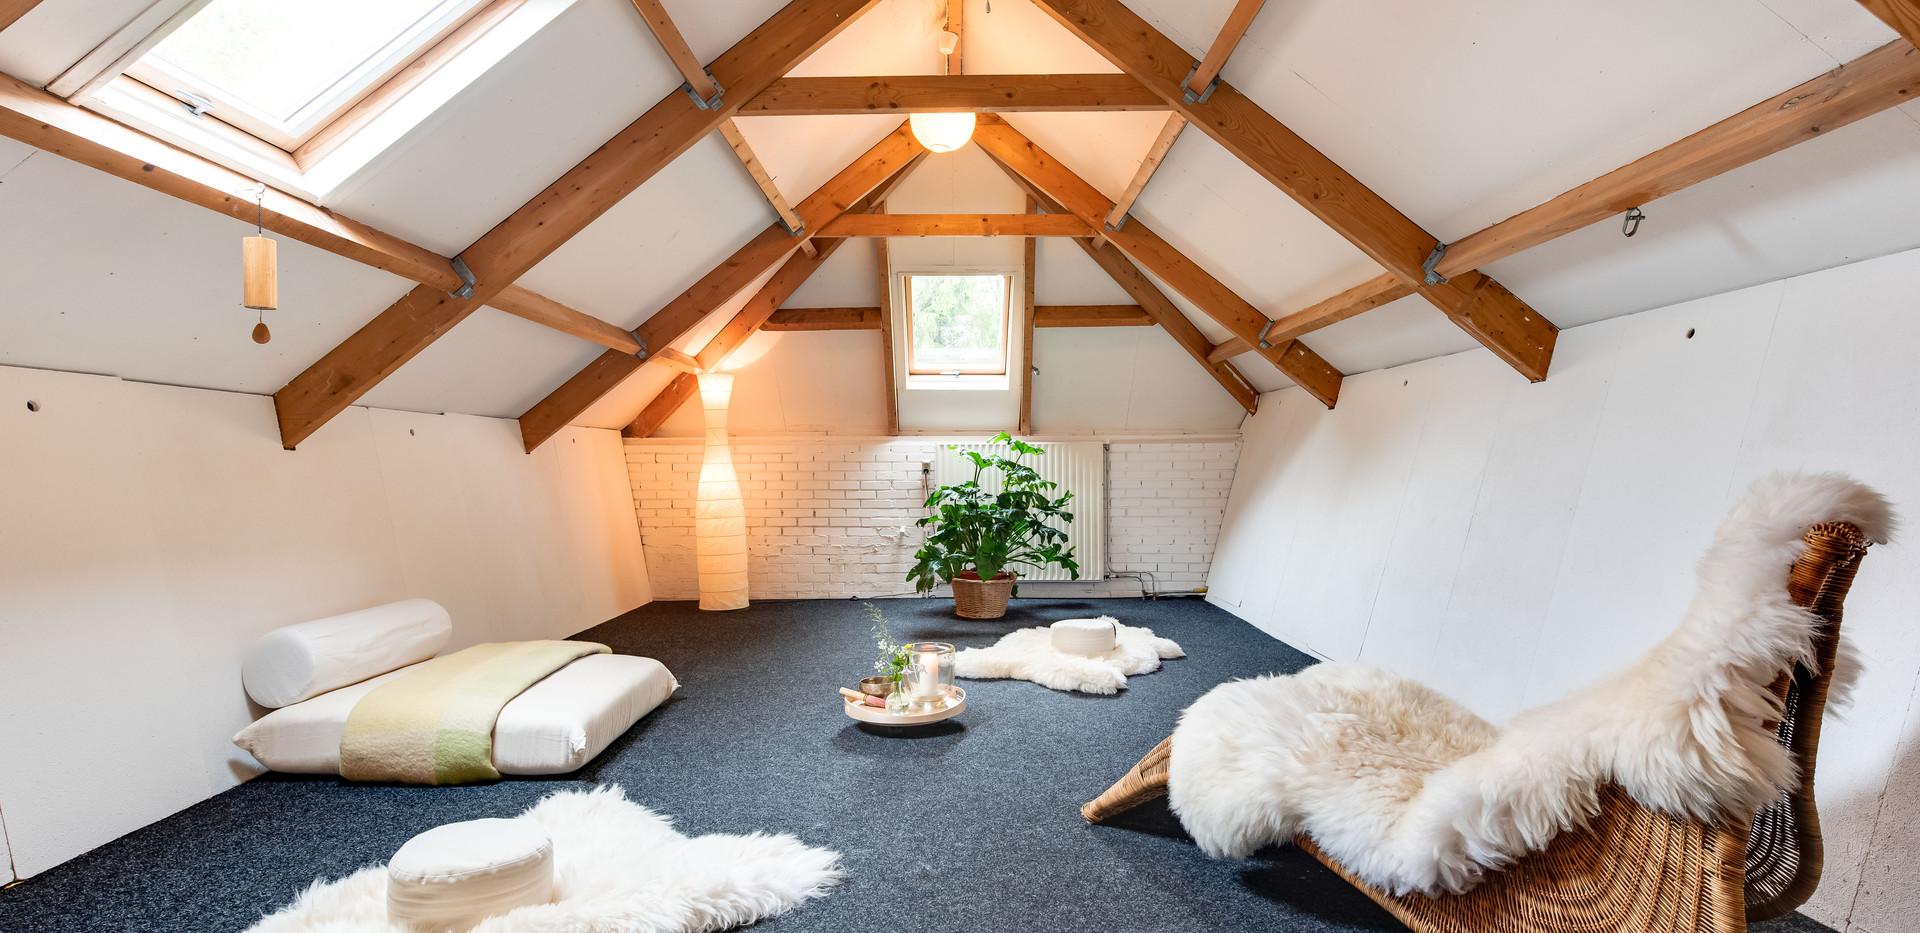 Groepsaccommodatie-met-yogazaal